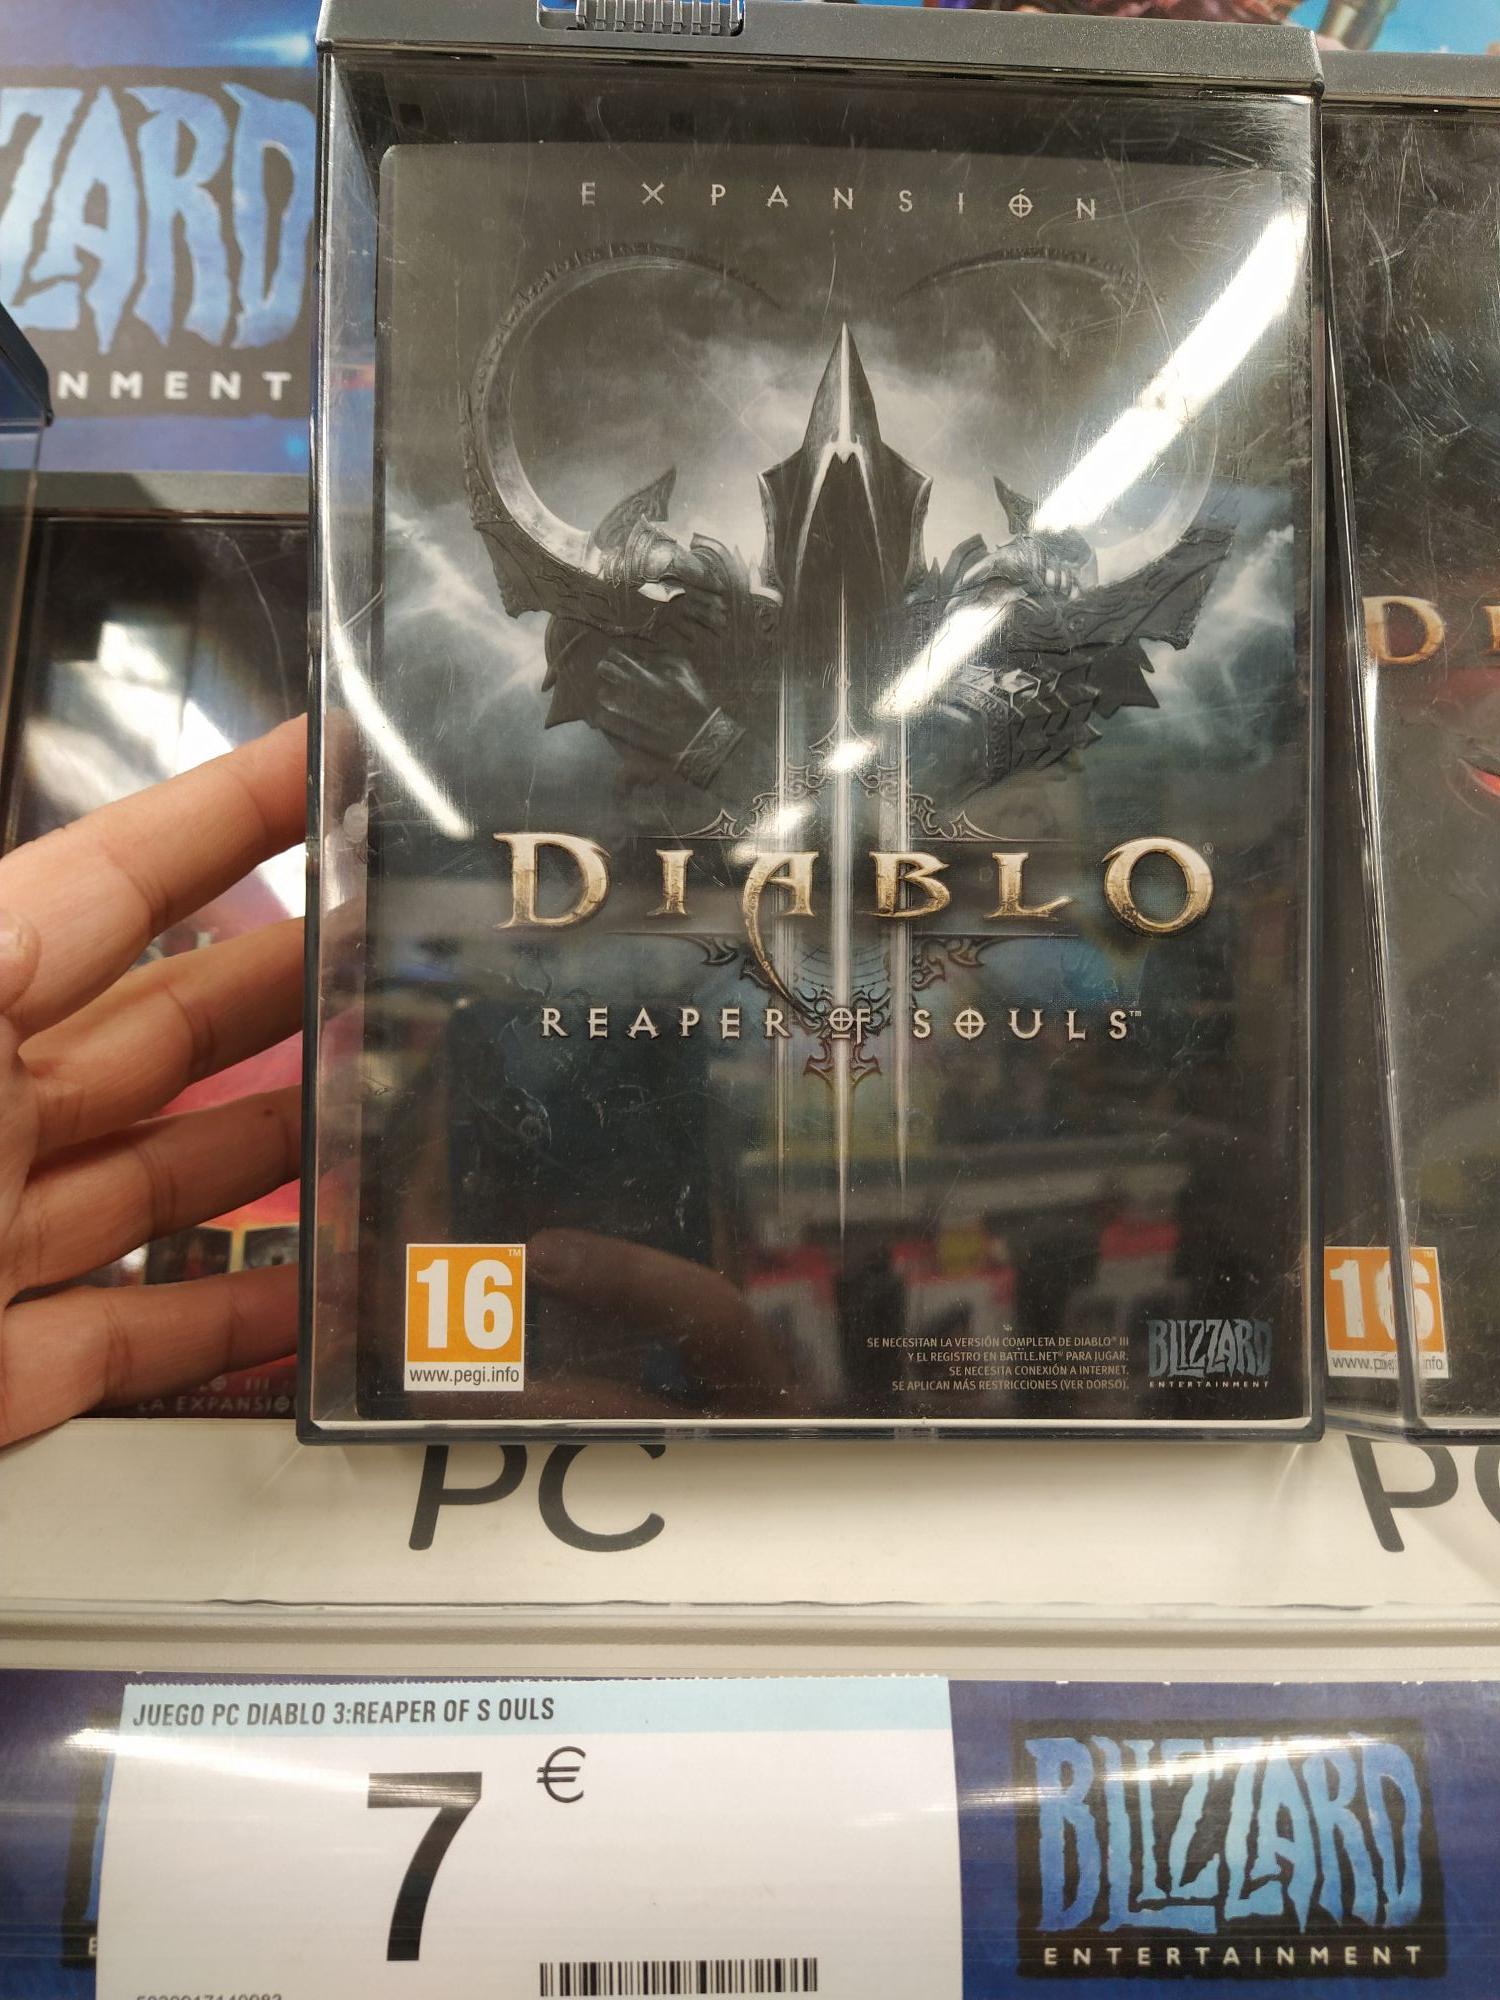 Reaper If Souls, expansión de Diablo III para PC en Carrefour Castellon